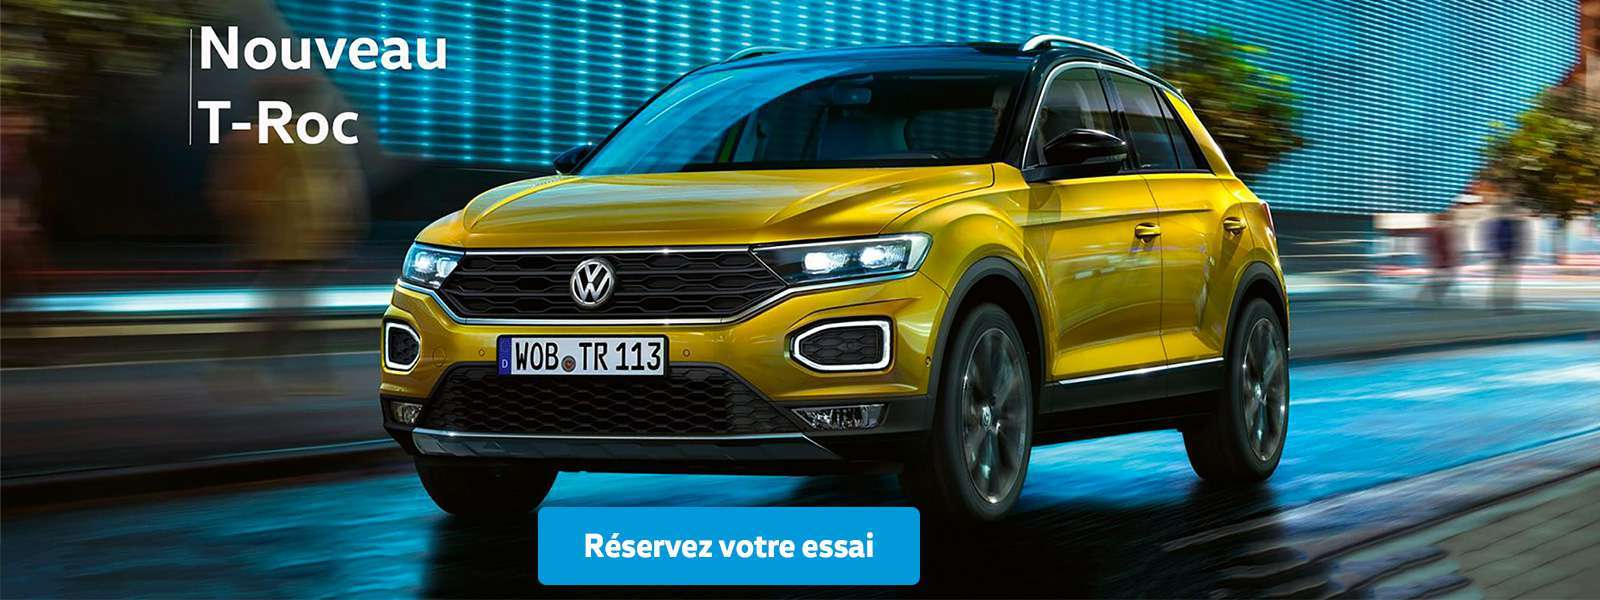 Blet rouen grand quevilly garage volkswagen rouen for Garage volkswagen grand quevilly